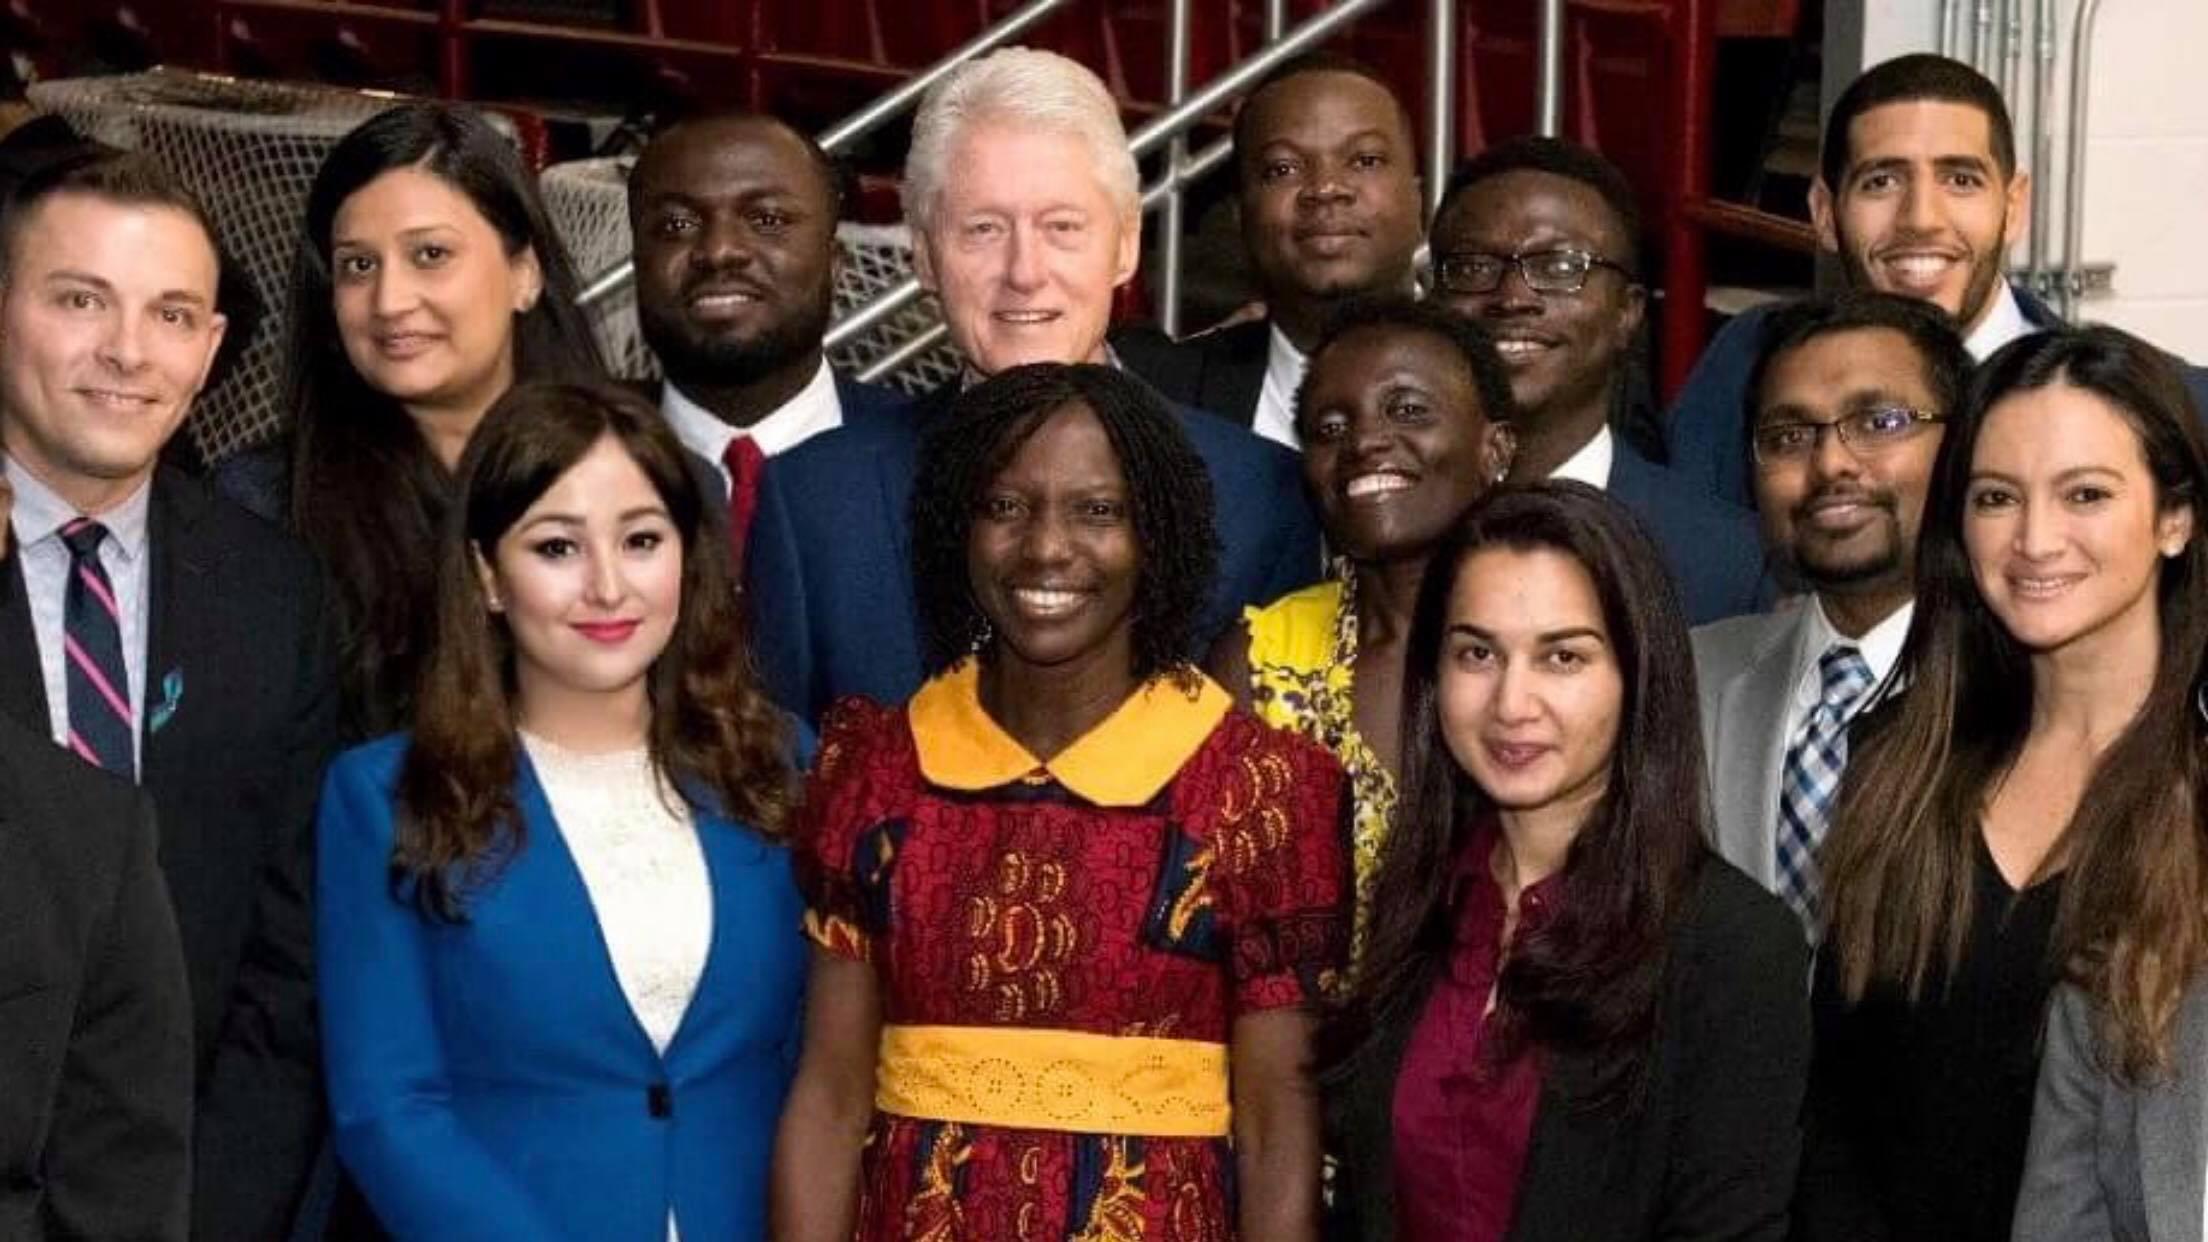 Kanchan Amatya wins Presidential Honor Roll Award from President Clinton